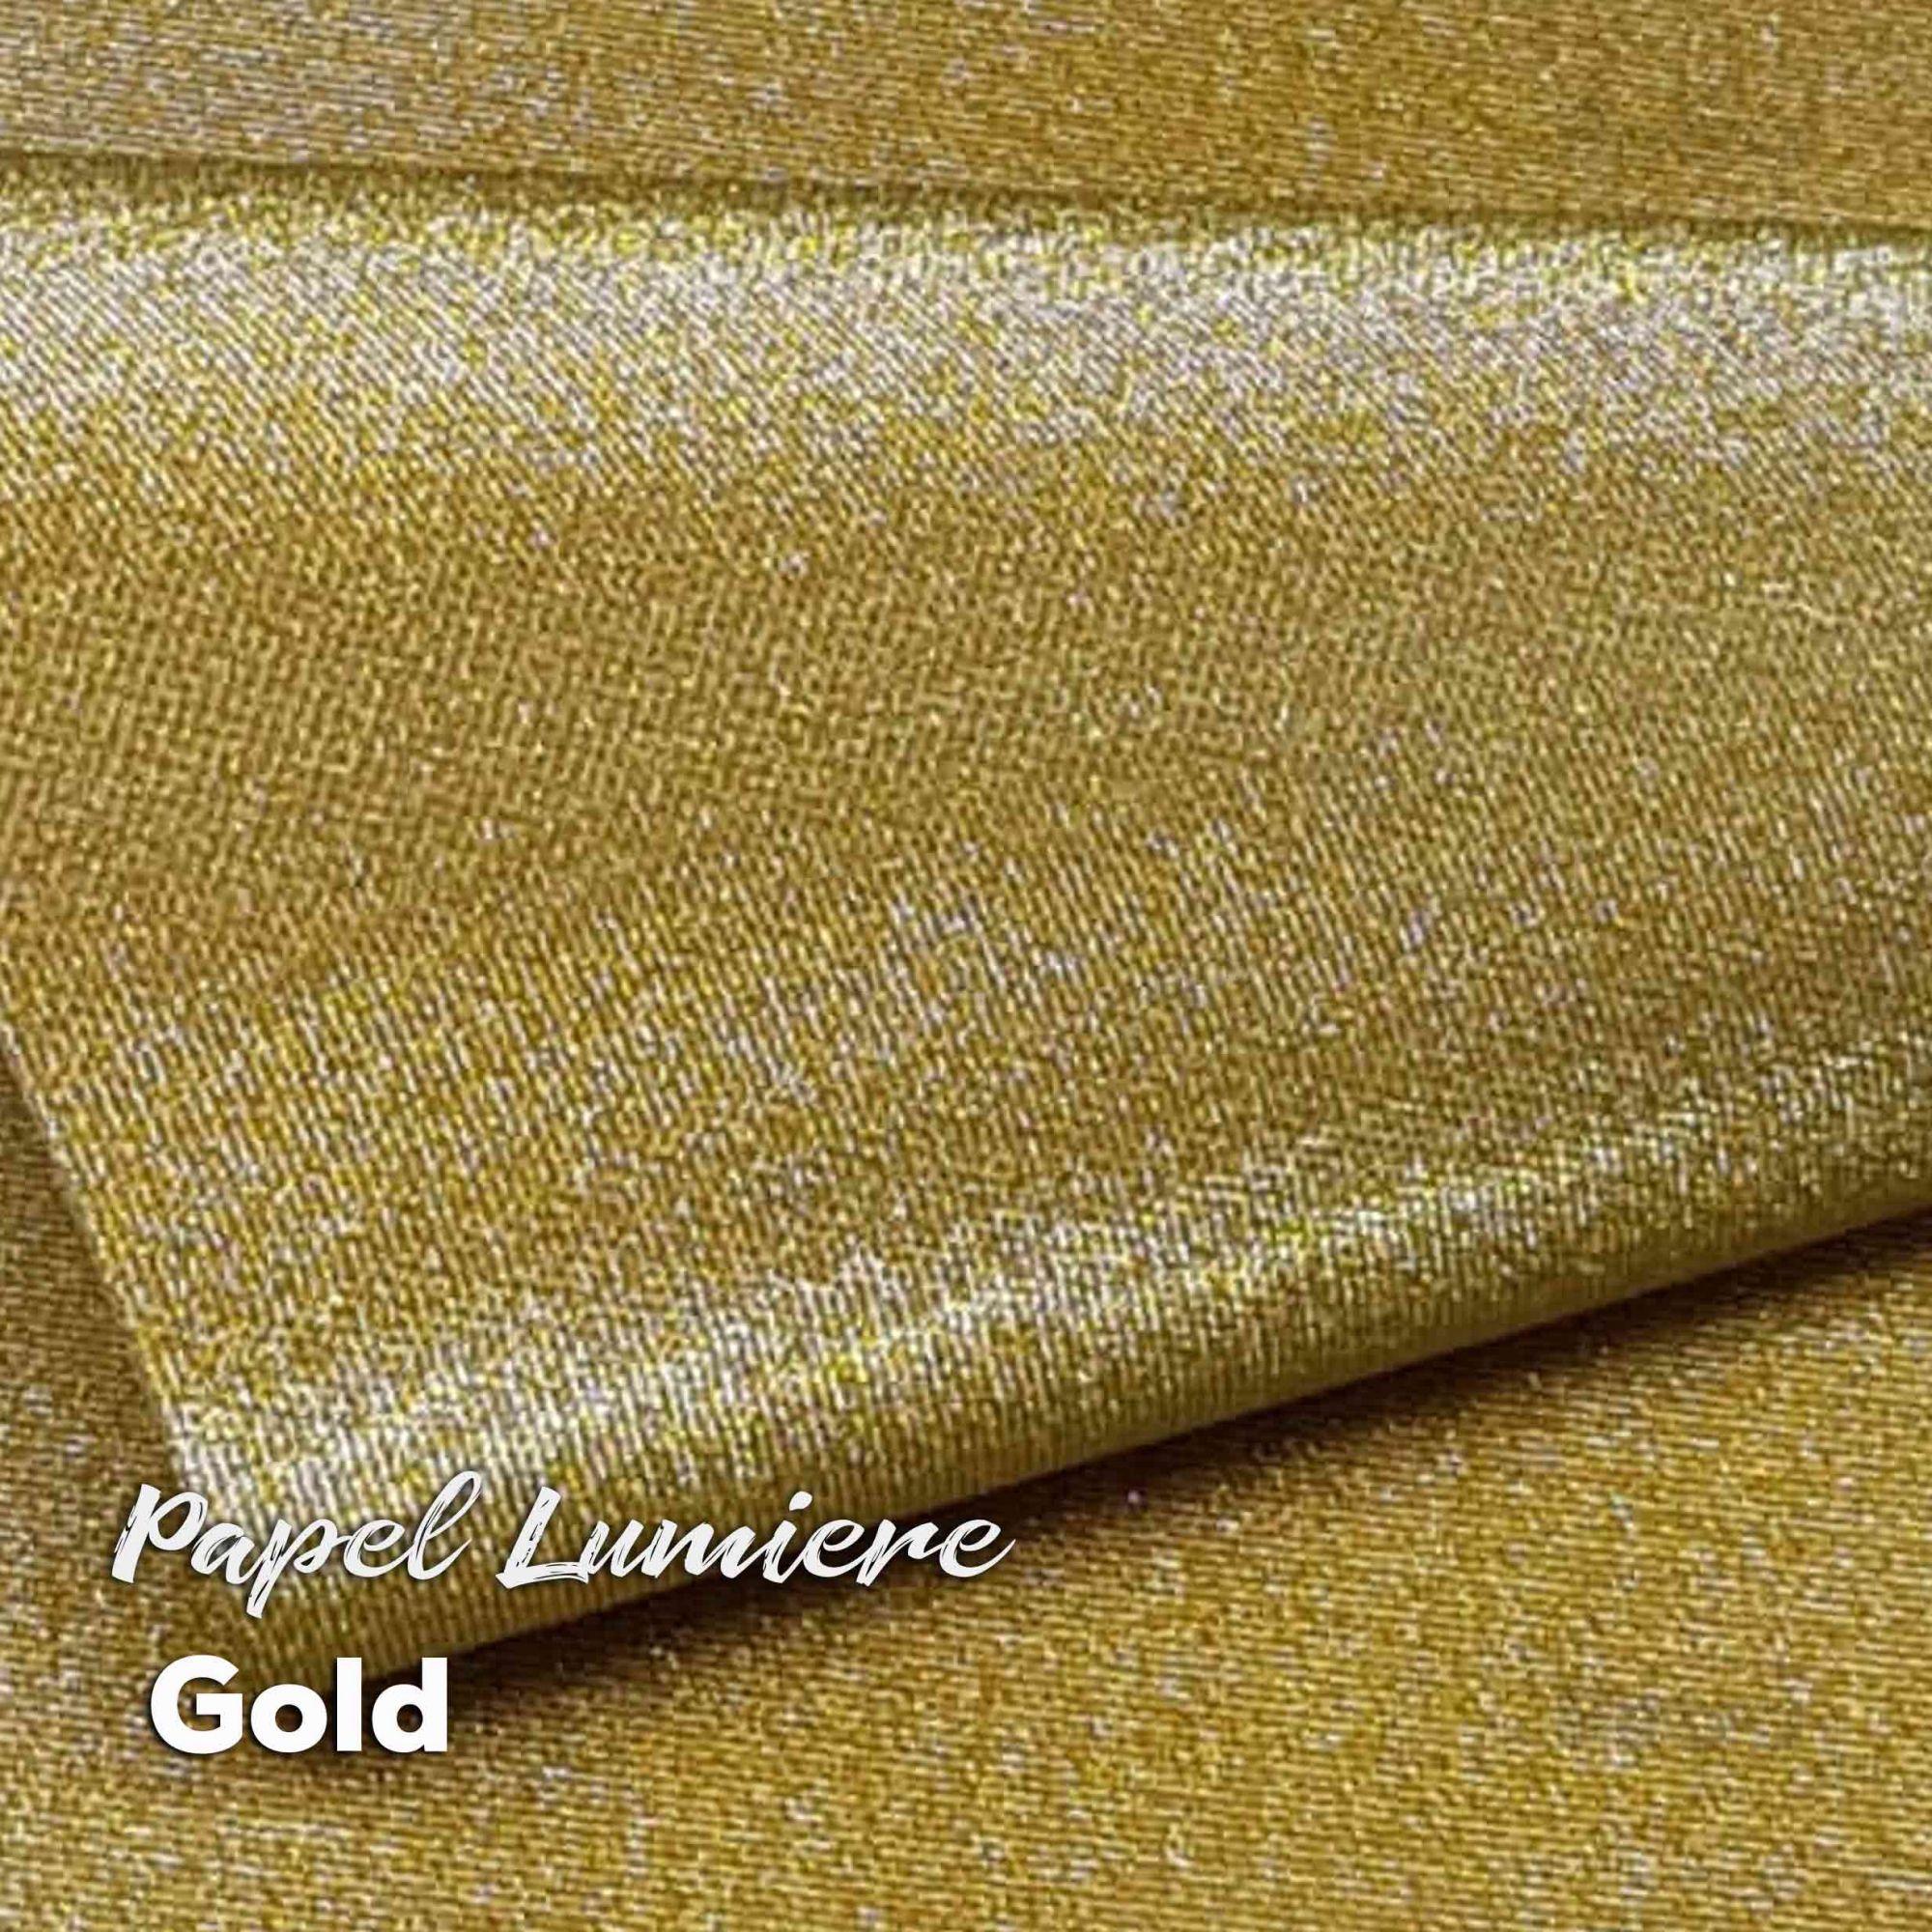 Papel Glitter Lumiere Gold 150g - Ouro - A4 com 10 folhas